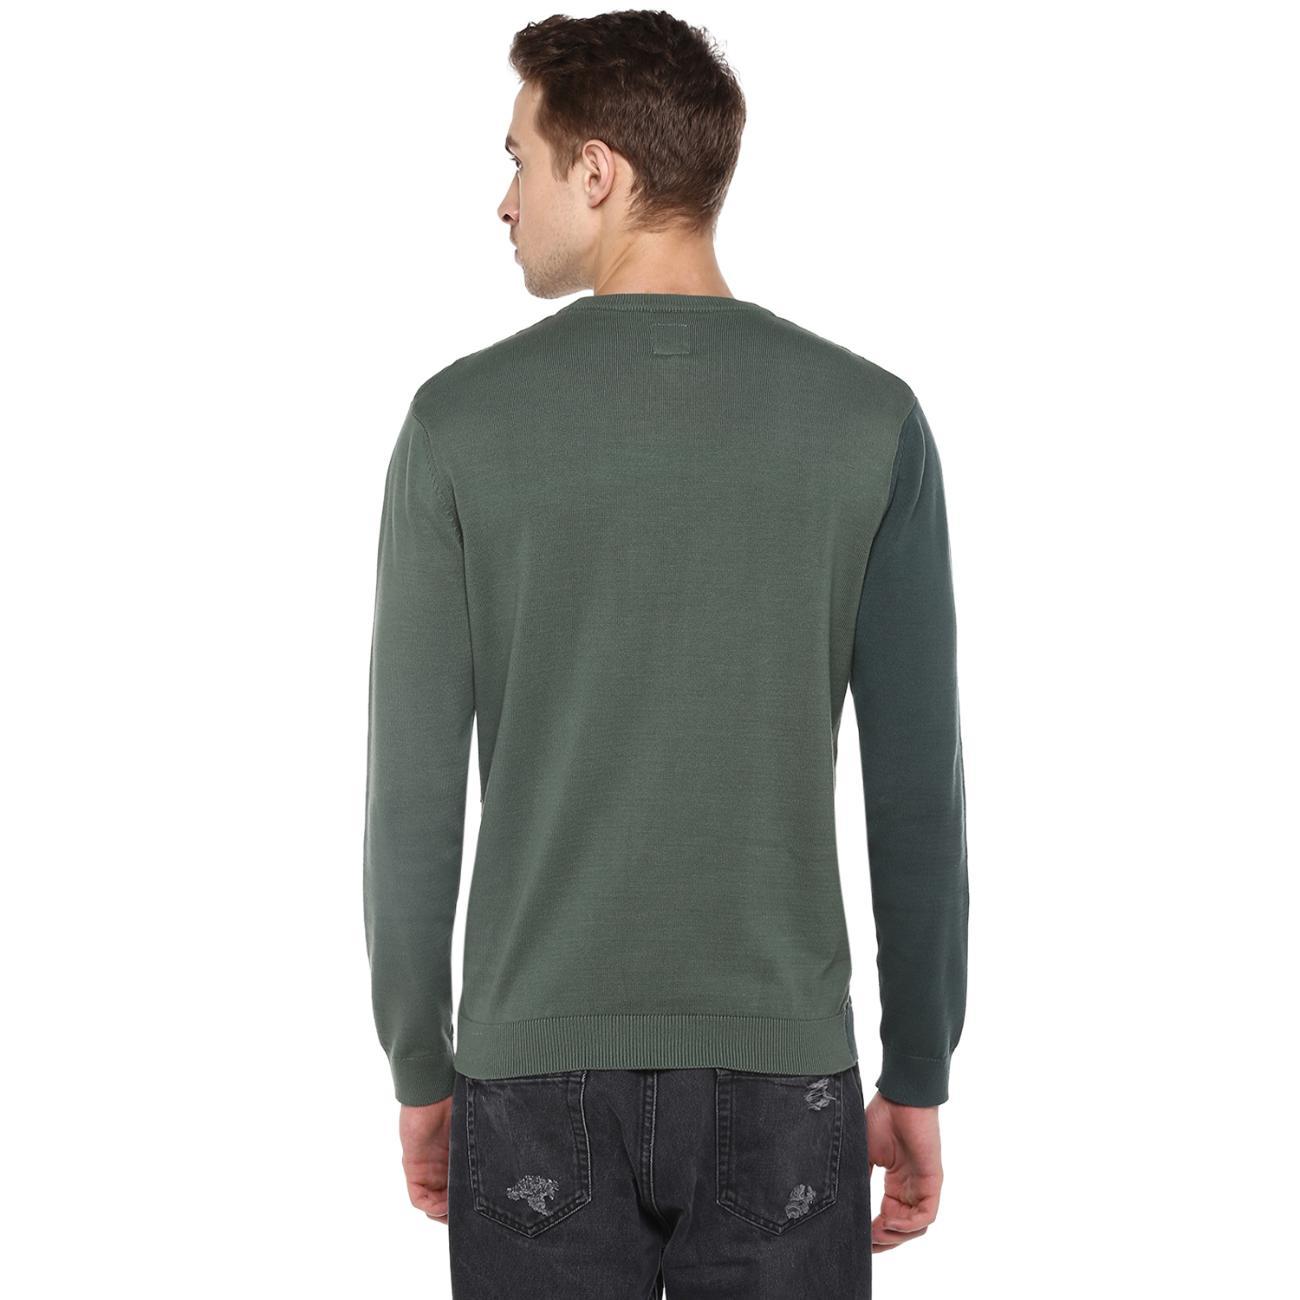 Shop Men's Green Colourblocked Sweater